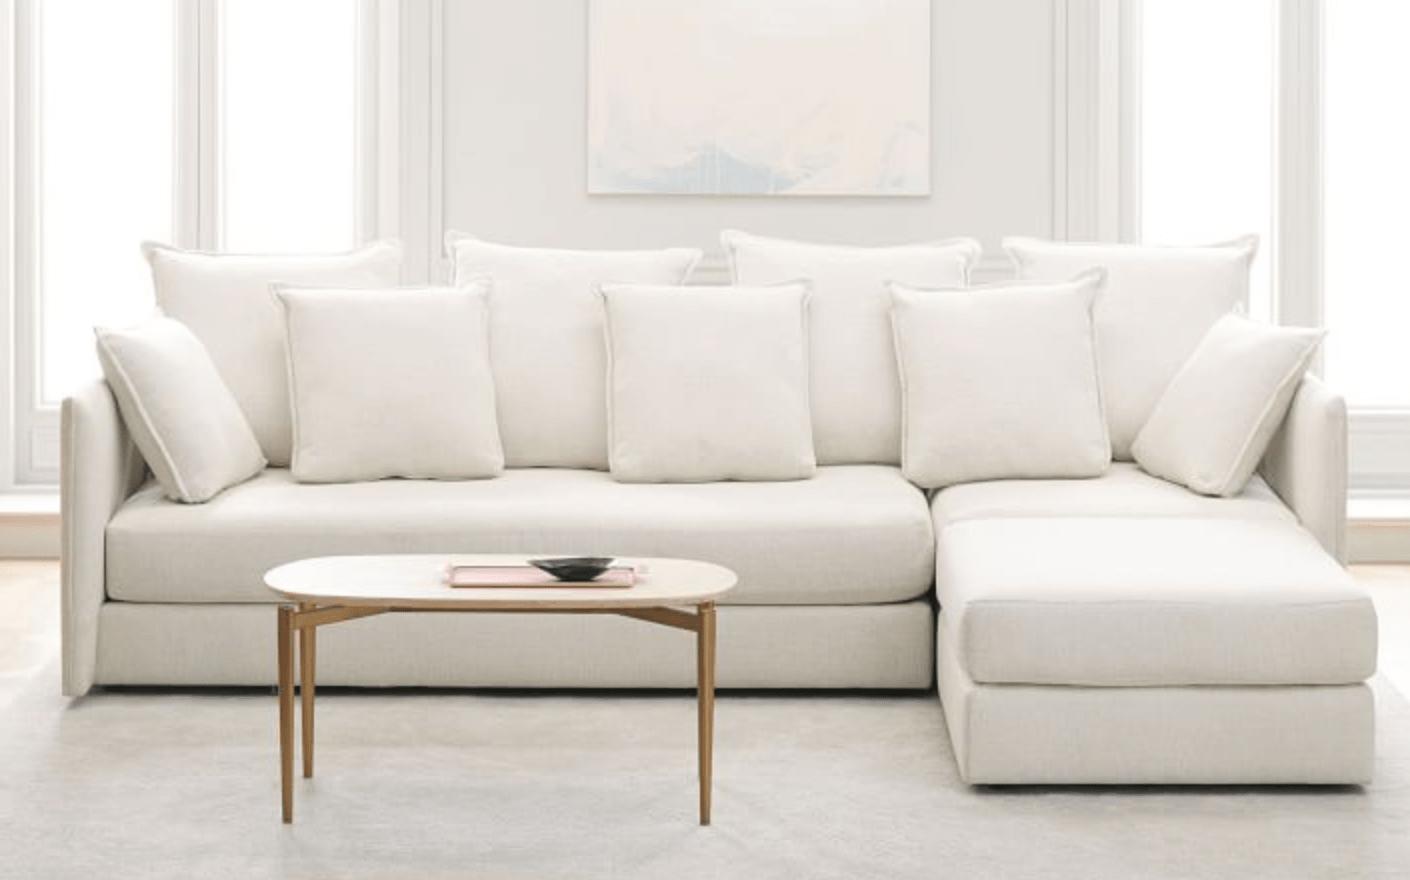 sofas and stuff alton sofa armrest remote control holder apartment decor minimalist furniture ideas fairfield